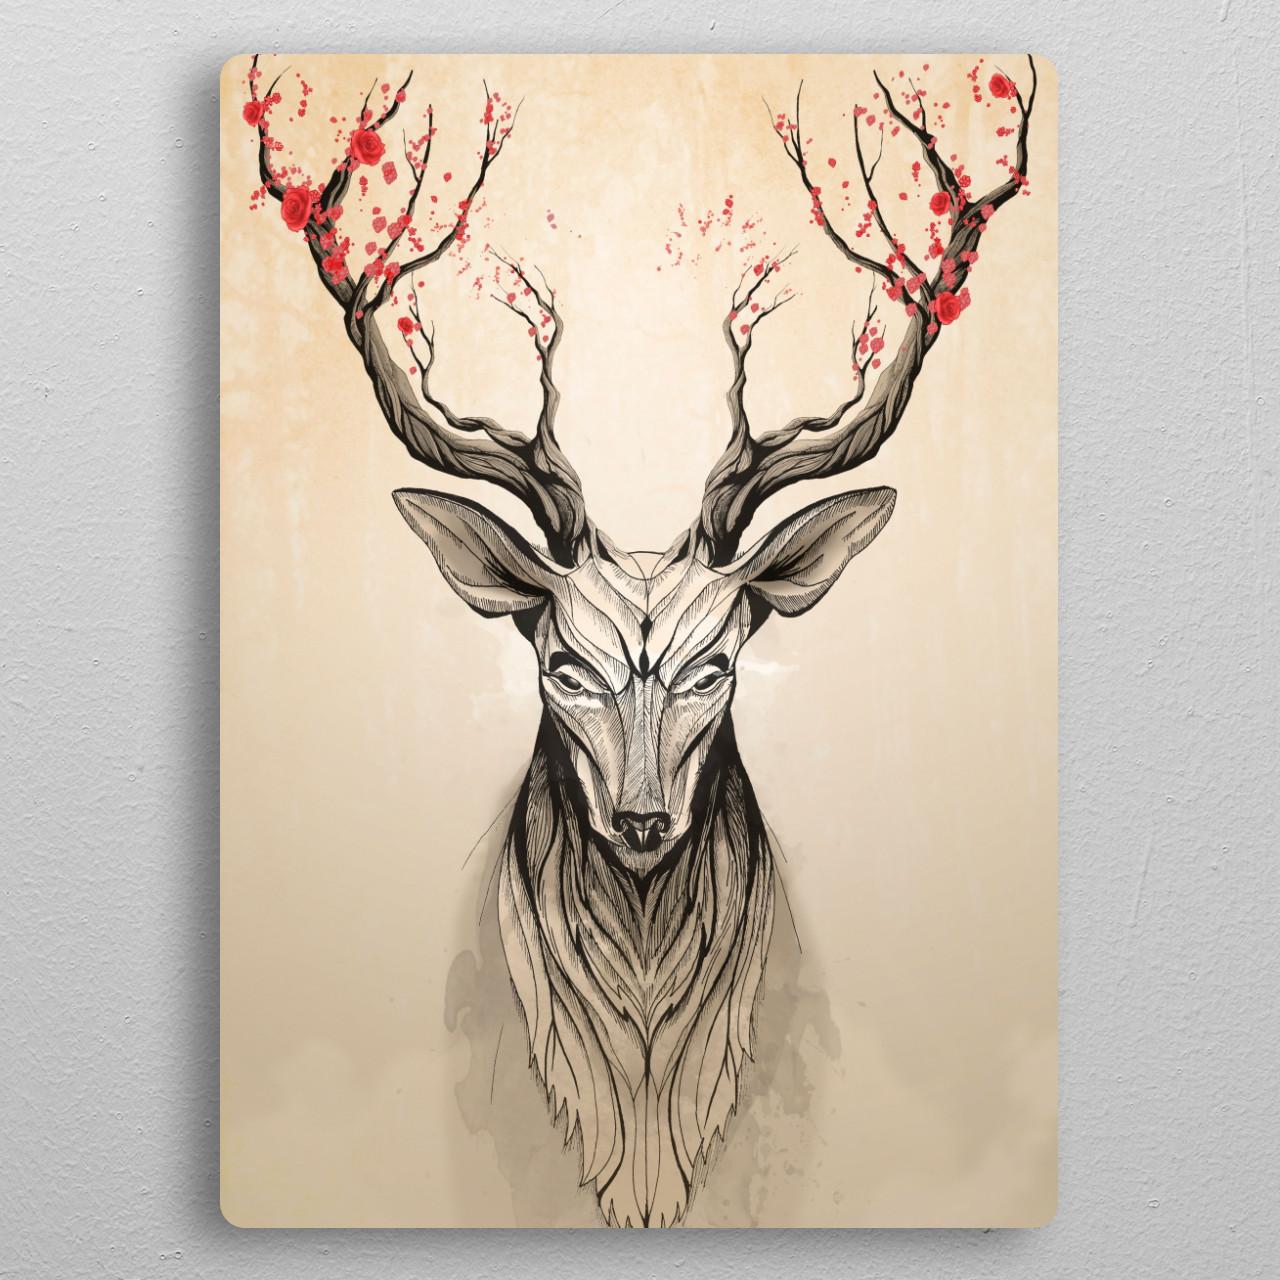 Deer Tree pocket-size metal print from Black box